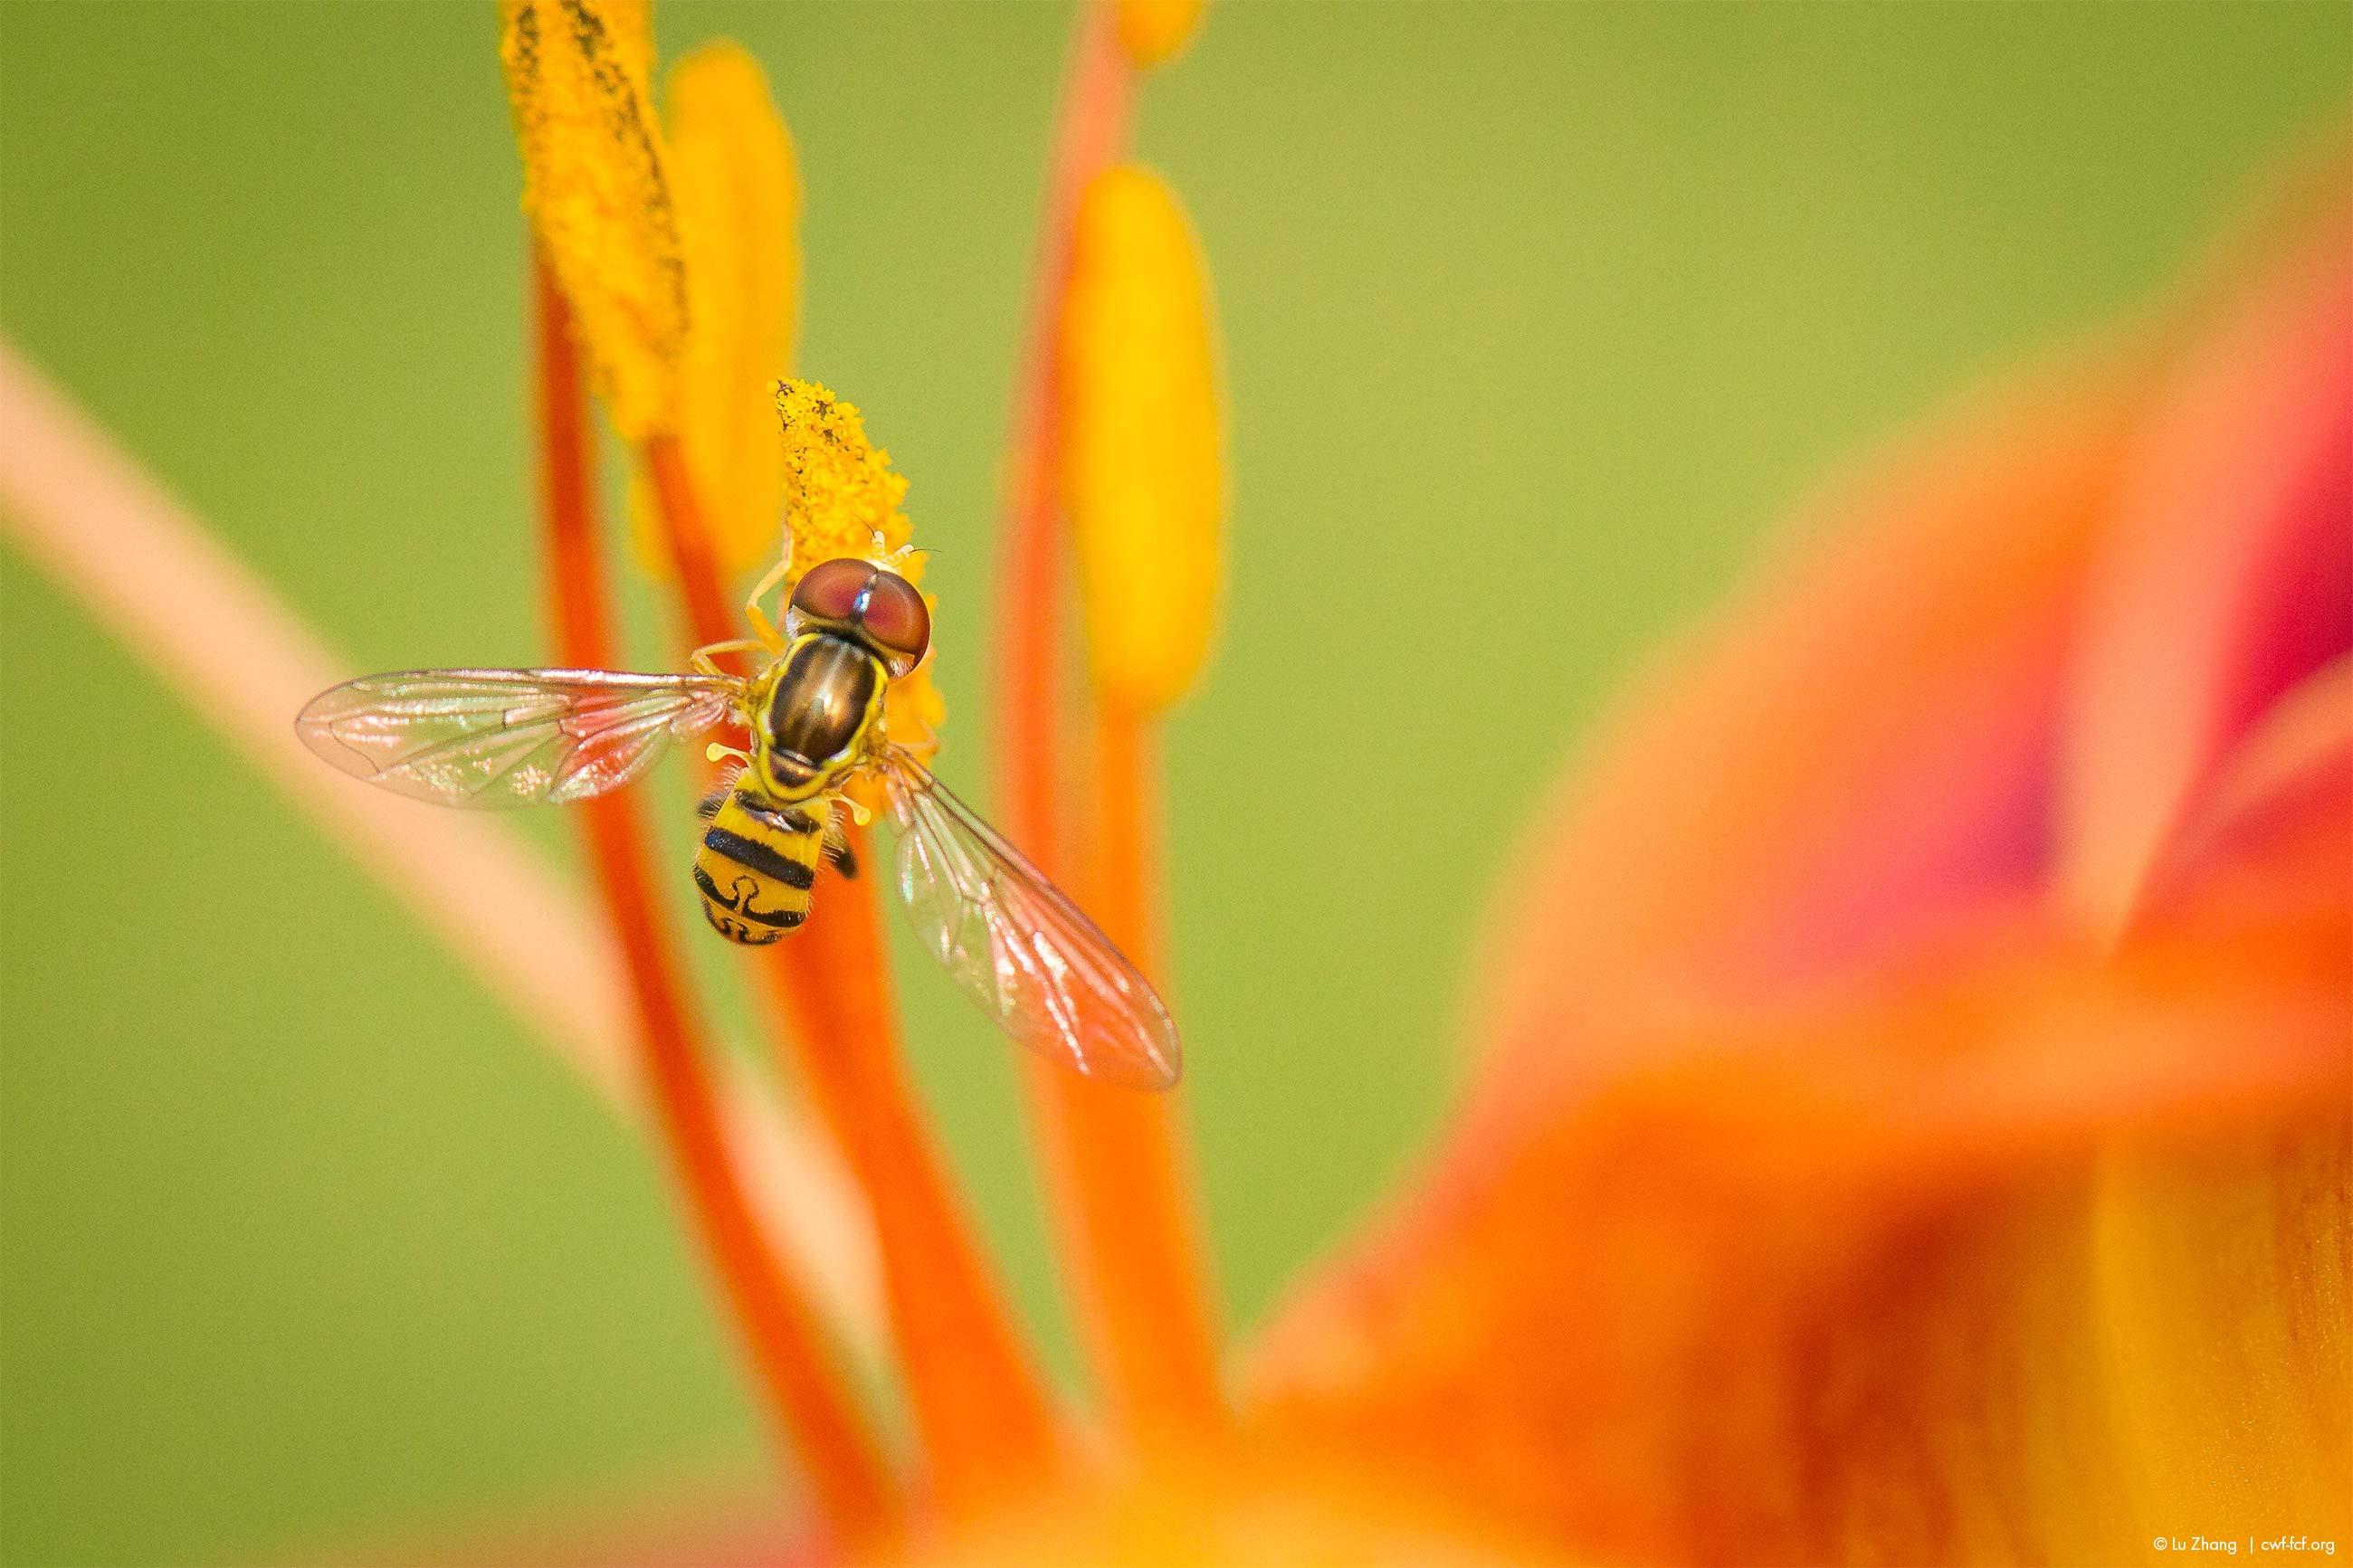 May 2017: Pollinators